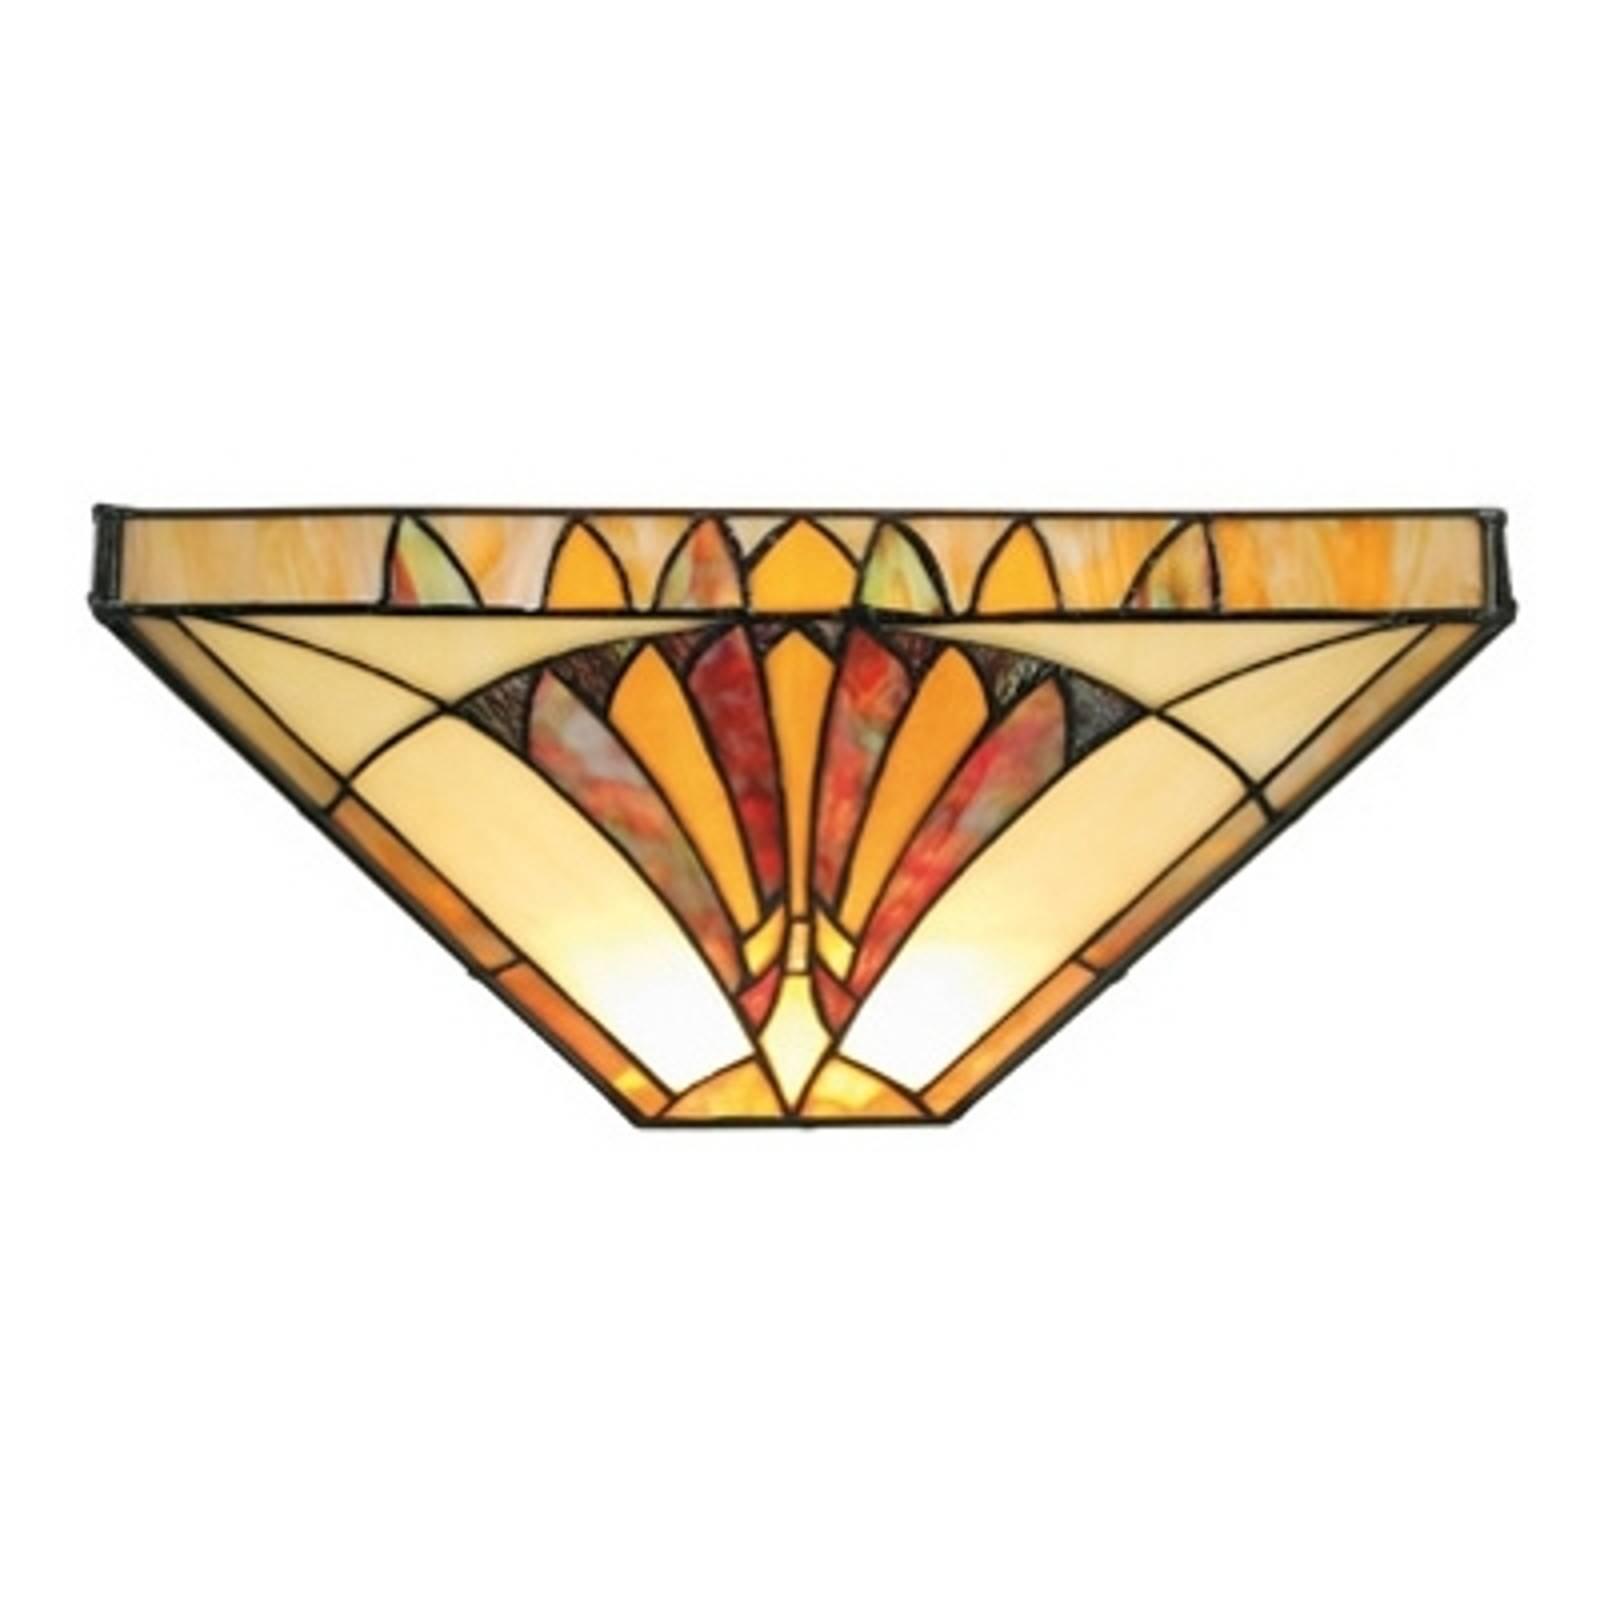 Effectieve wandlamp AMALIA in Tiffany-stijl